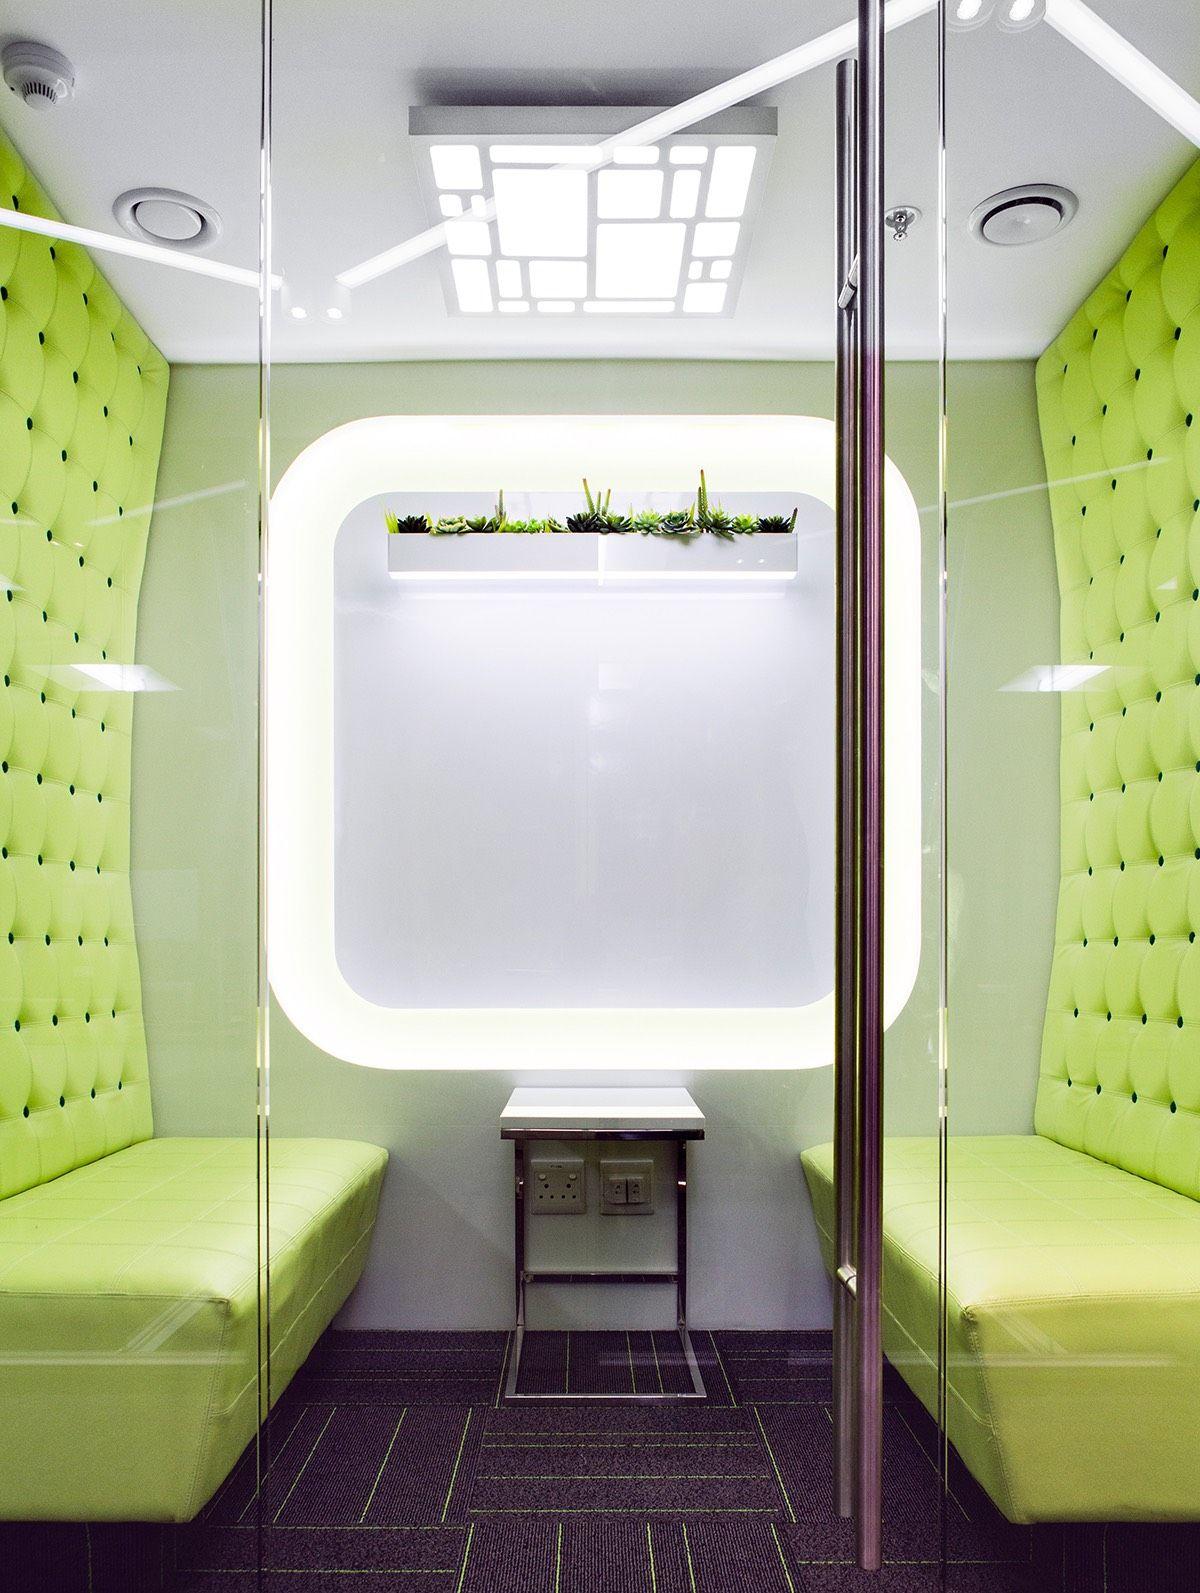 A Tour Of Korbicom S Sleek New Cape Town Office Interior Design